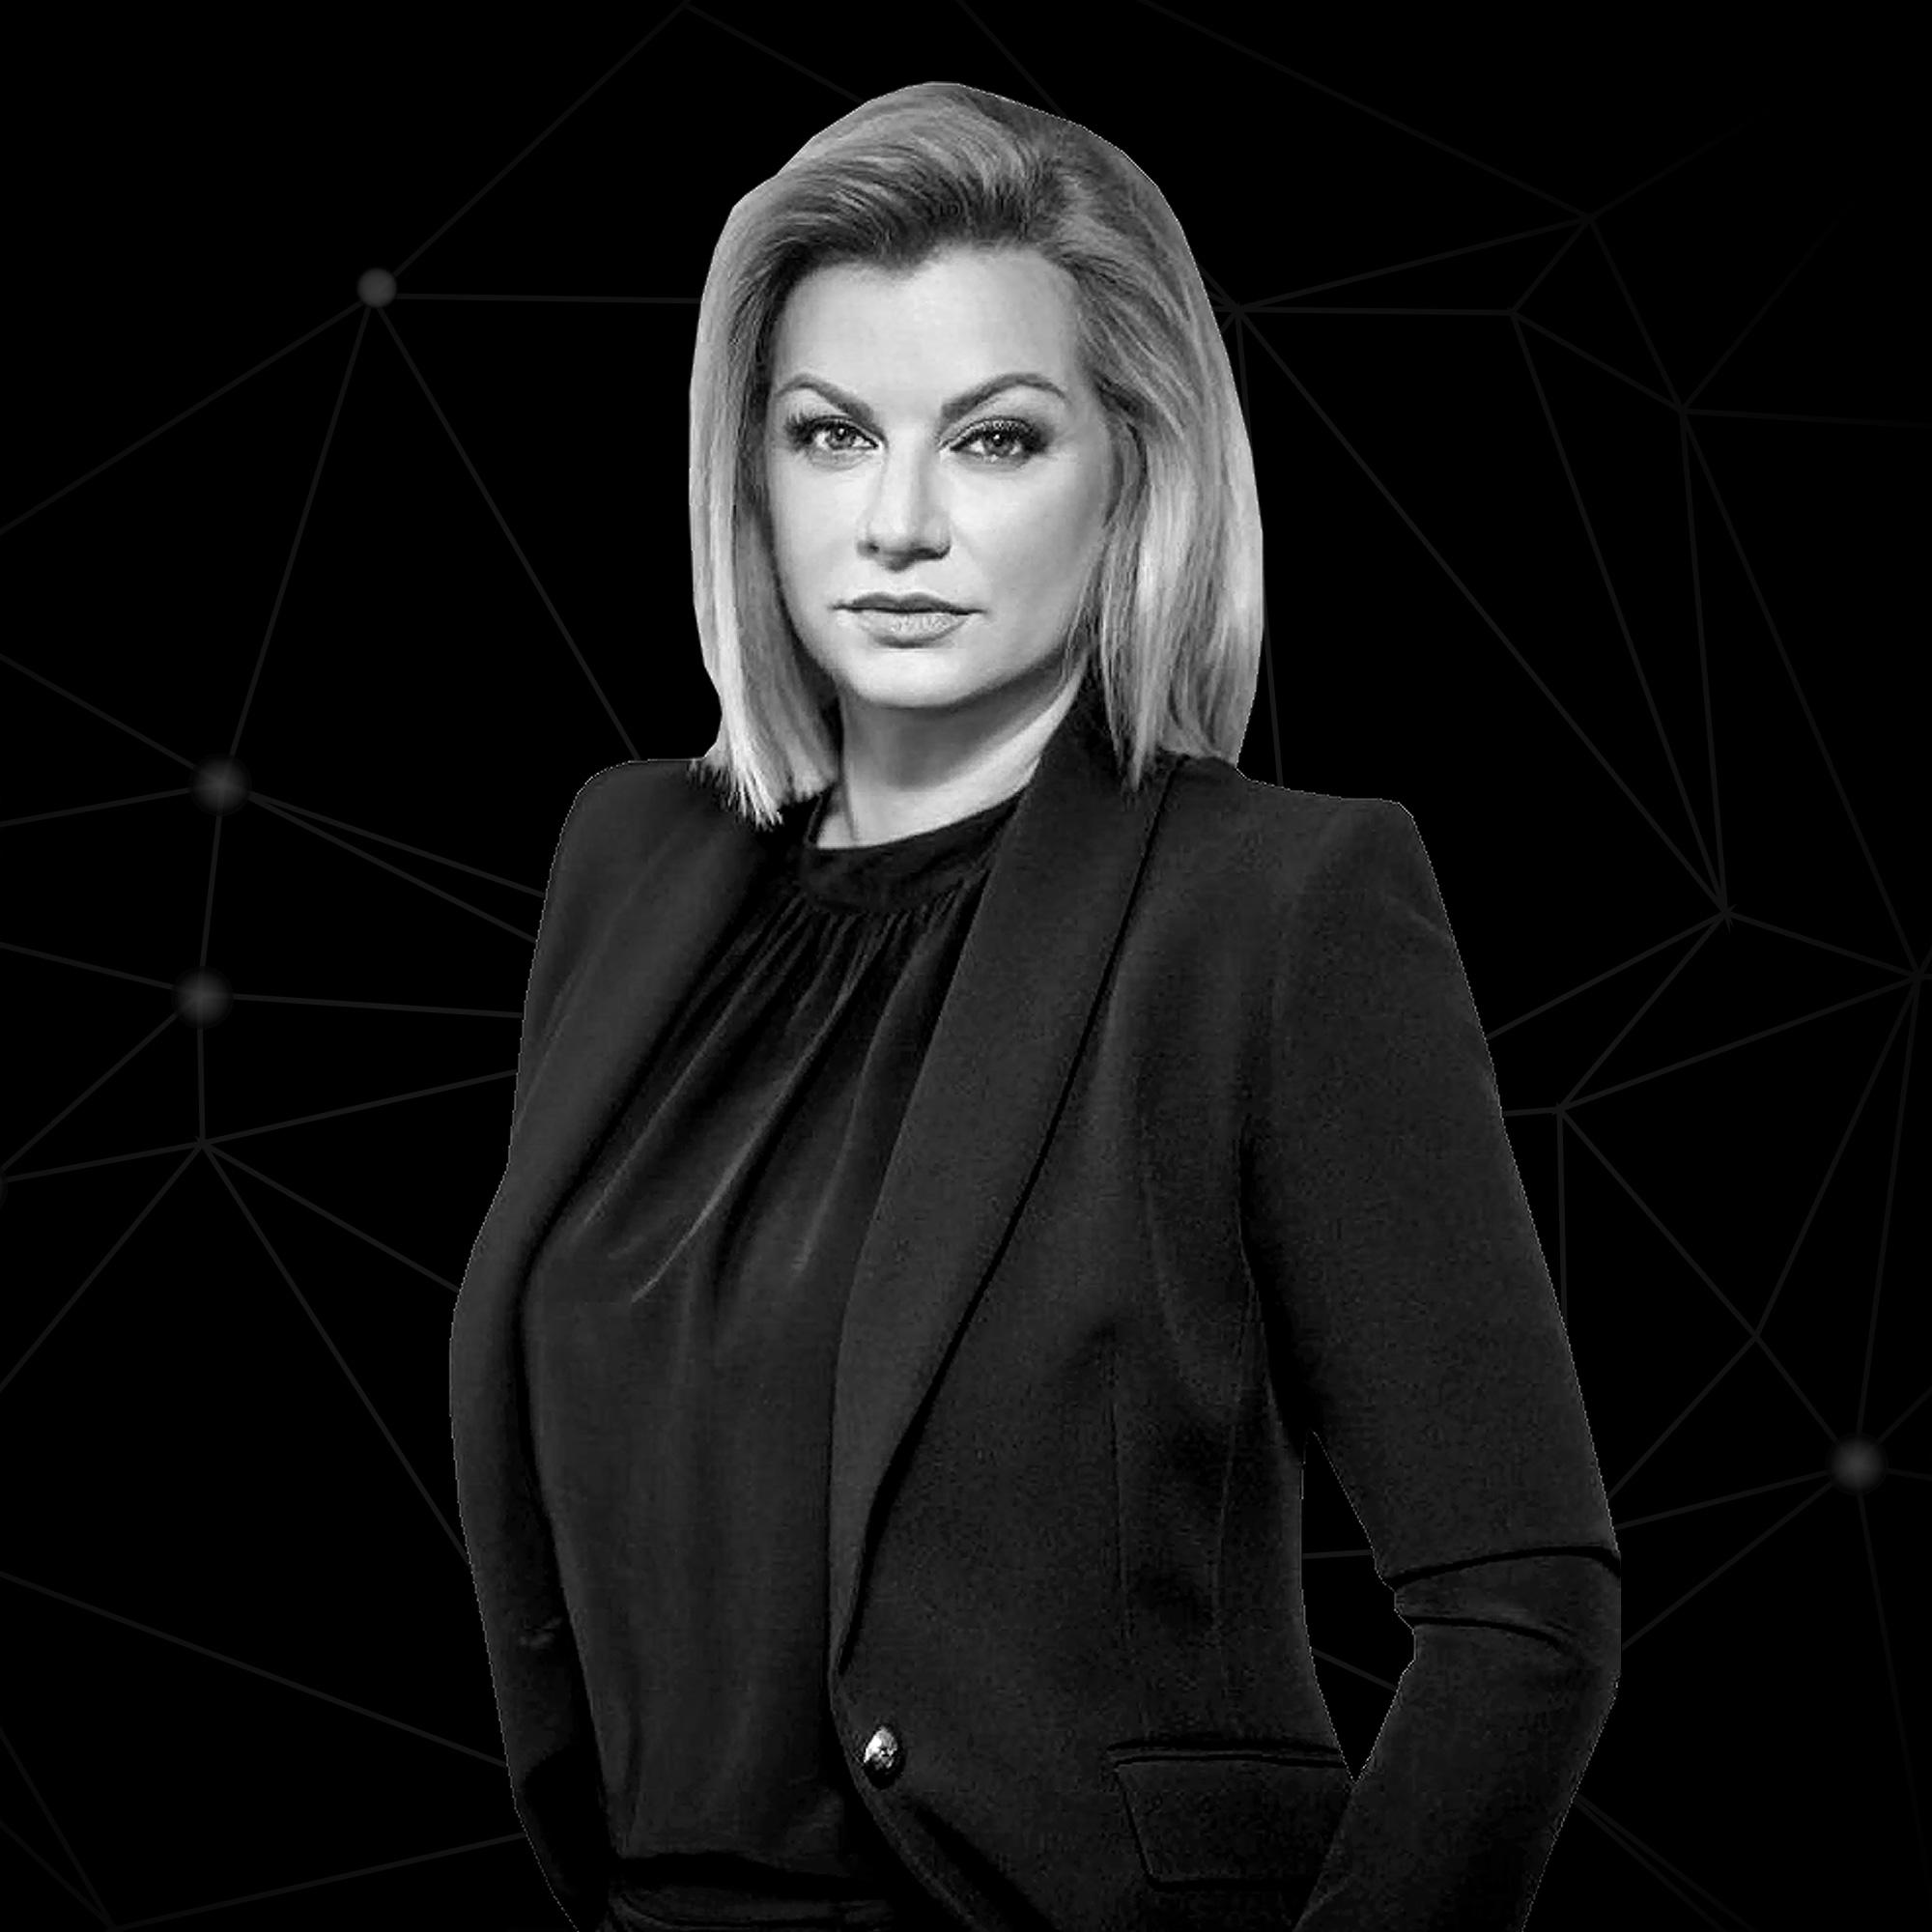 Ana Hanžeković